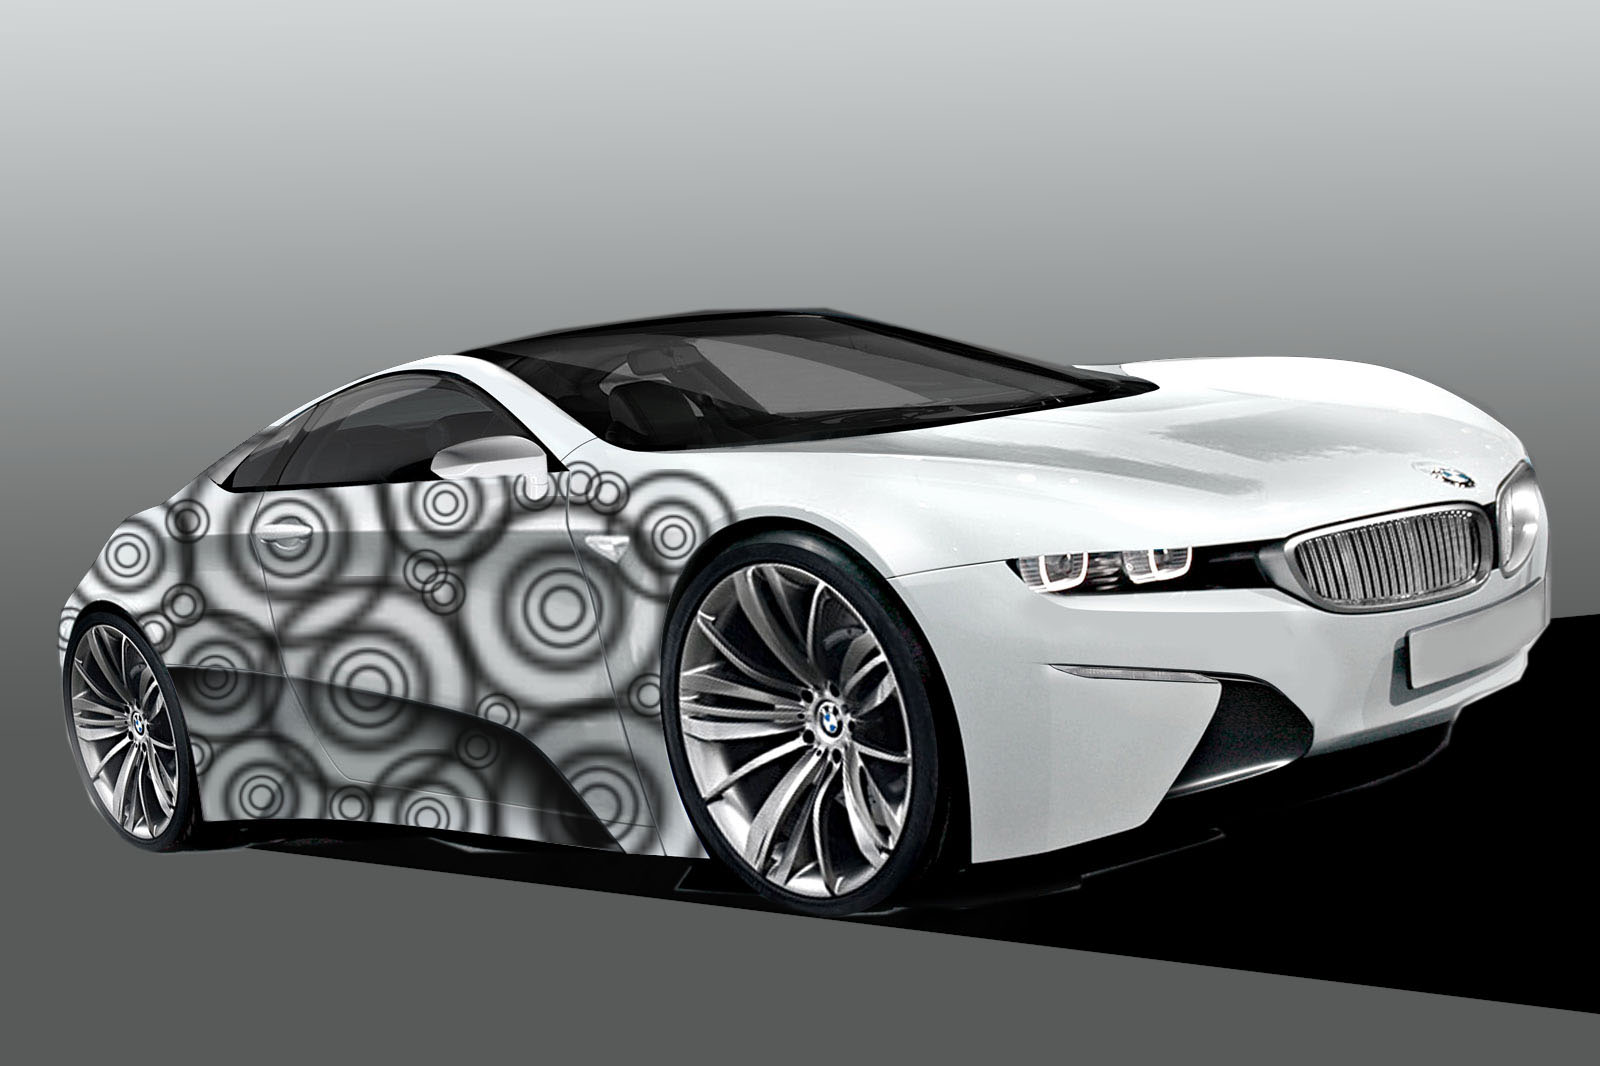 http://4.bp.blogspot.com/-UplFY8CymWw/Tp5Y5CJZbmI/AAAAAAAAAfU/D4BU-lcht-k/s1600/BMW+M1+2012+decals.jpg